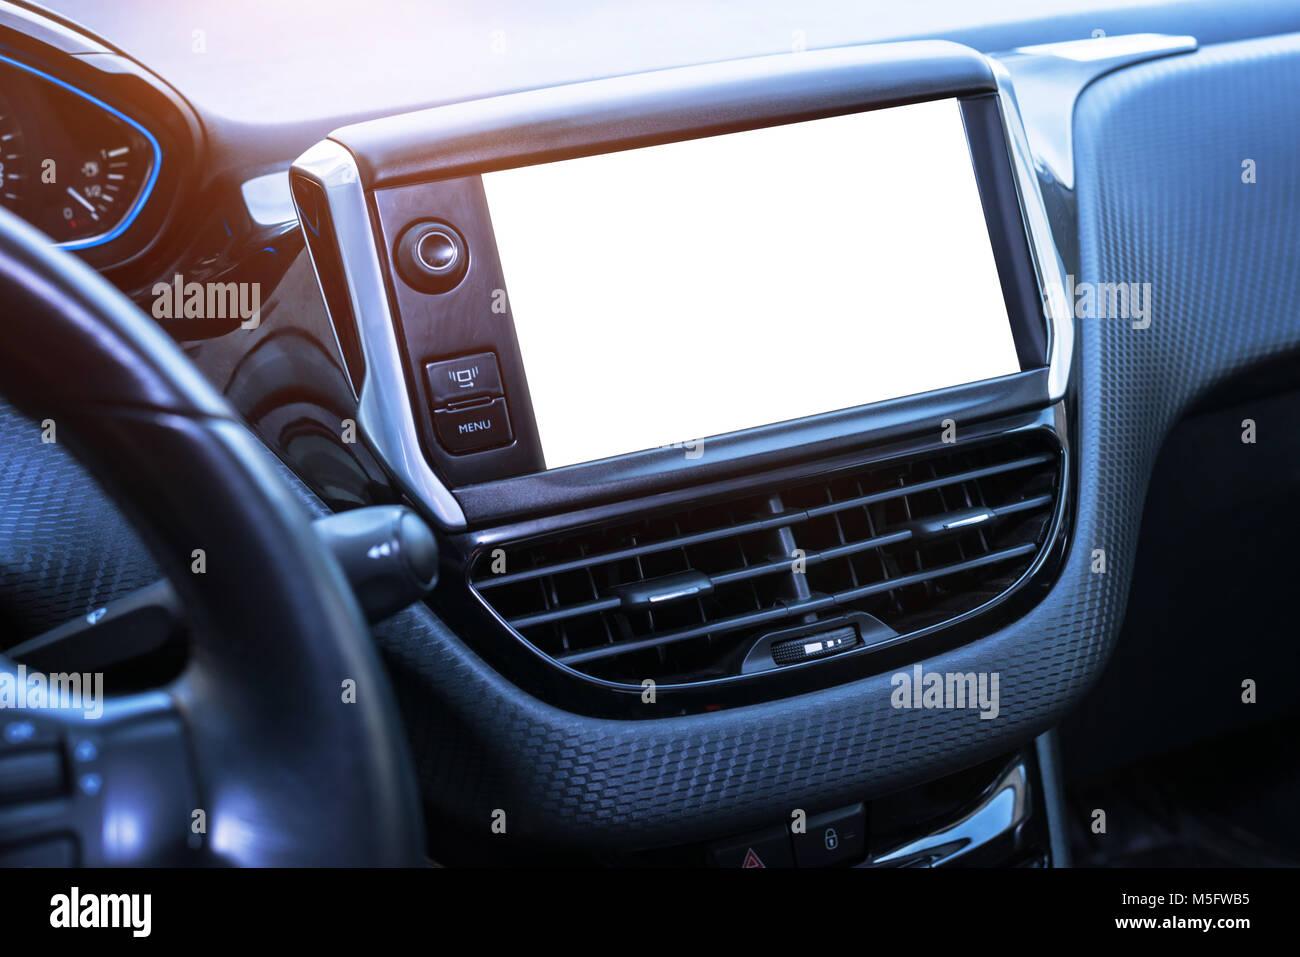 Car navigation system display isoalted for mockup. - Stock Image